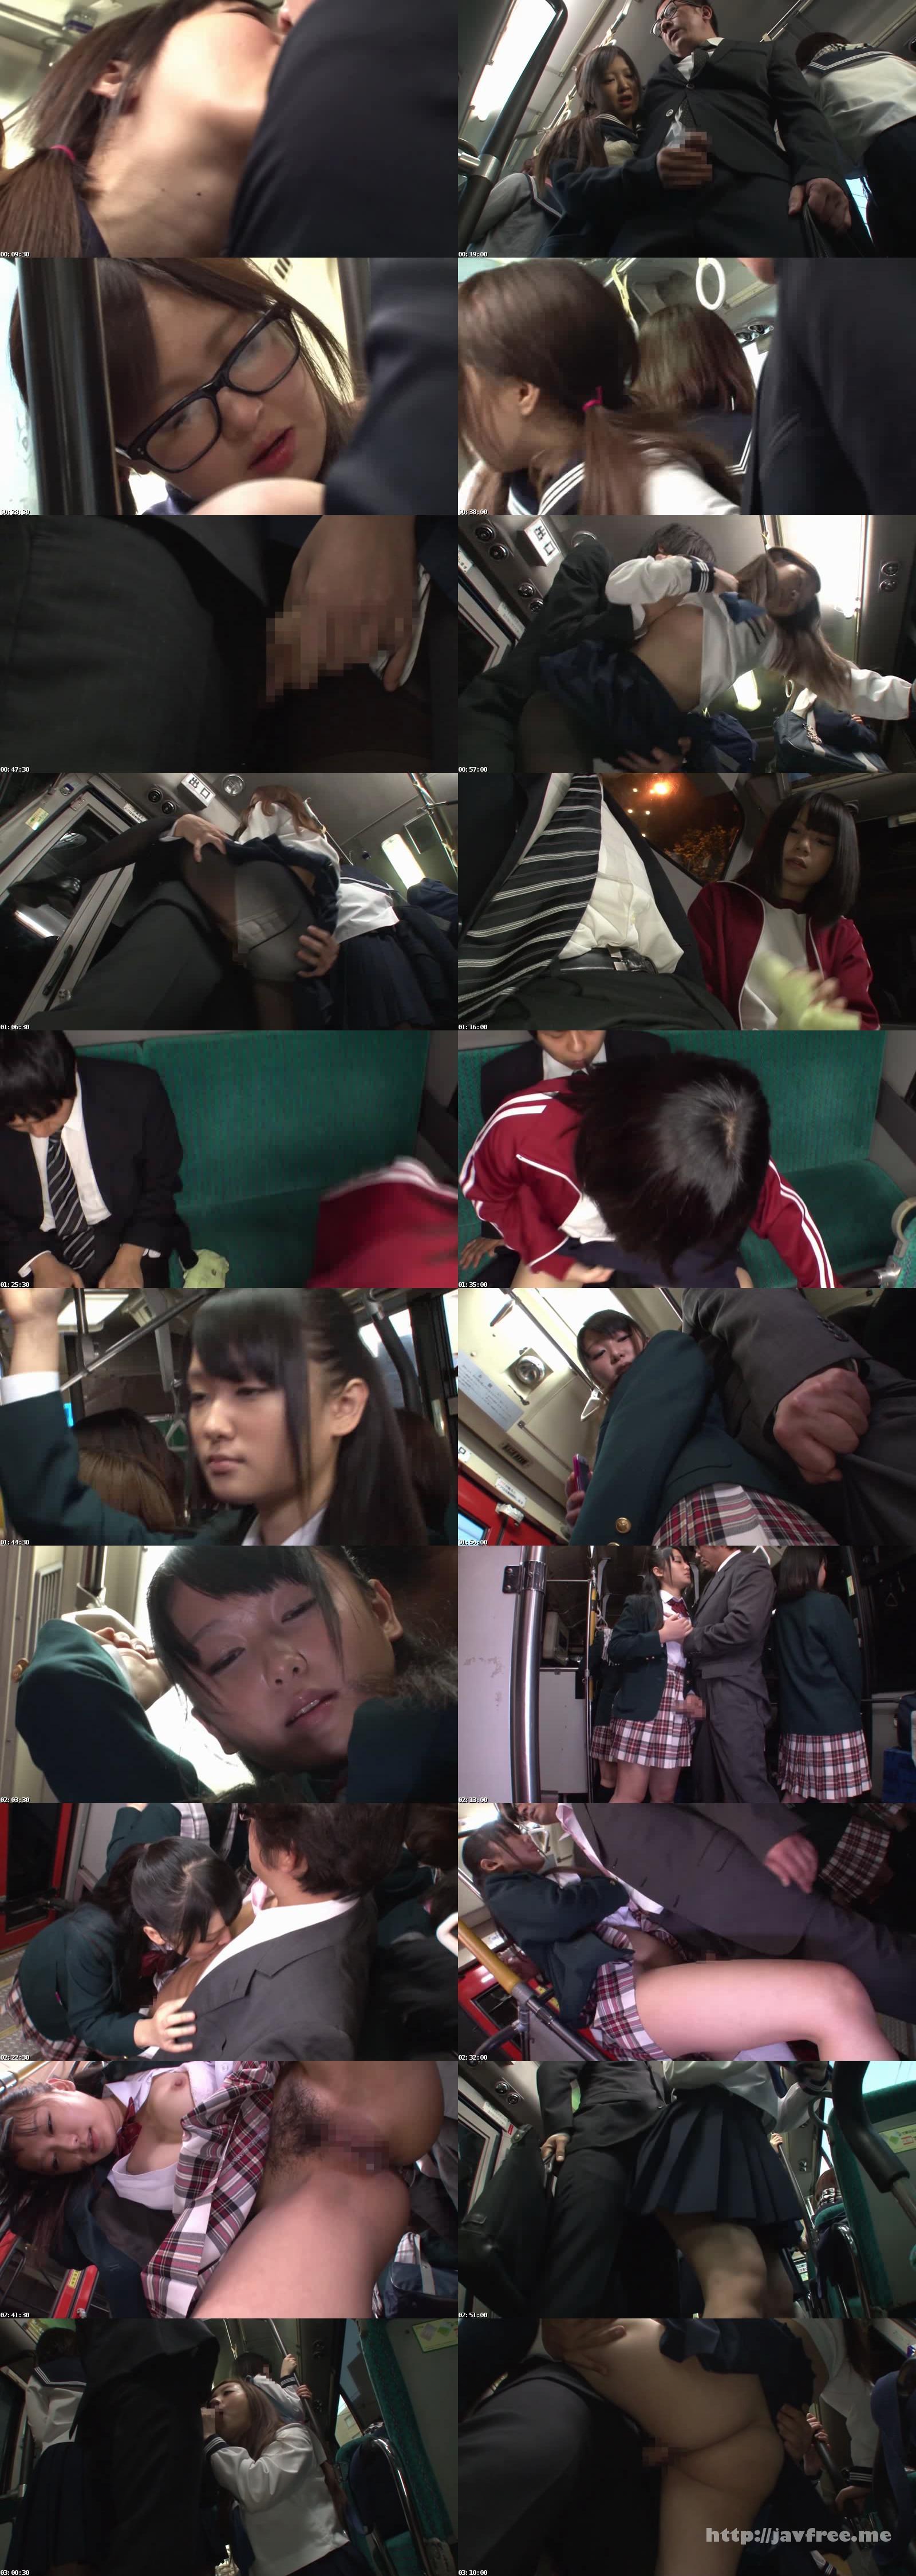 [DANDY-411] 「間違えたフリして女子●通学バスに乗り込んで生でヤられた」 VOL.4 - image DANDY-411 on https://javfree.me